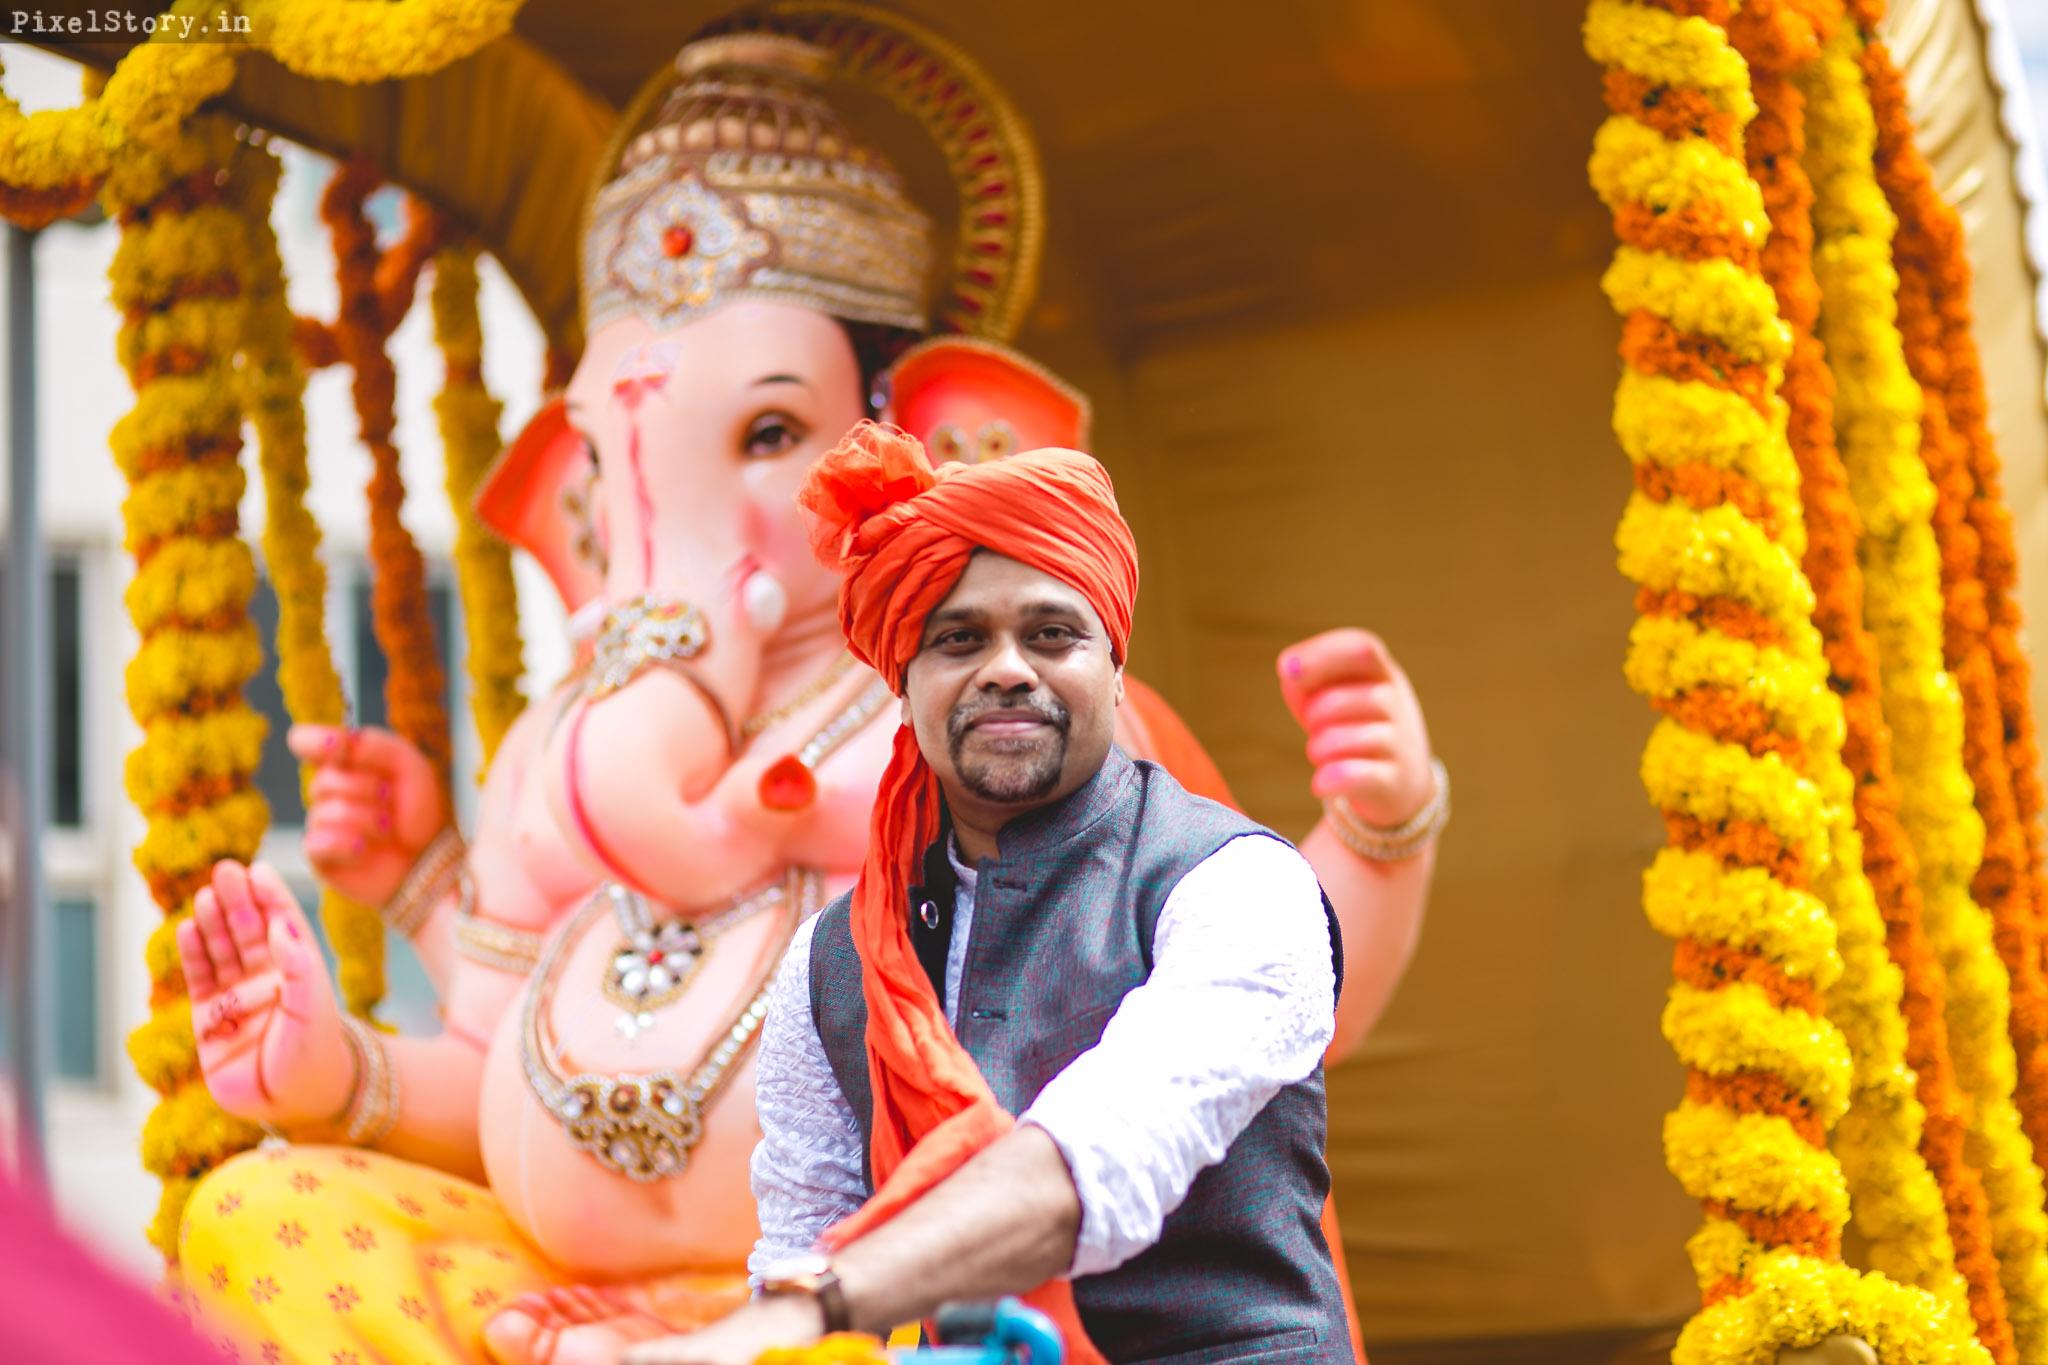 PixelStory-Ganesh-Utsav-2017-033.jpg